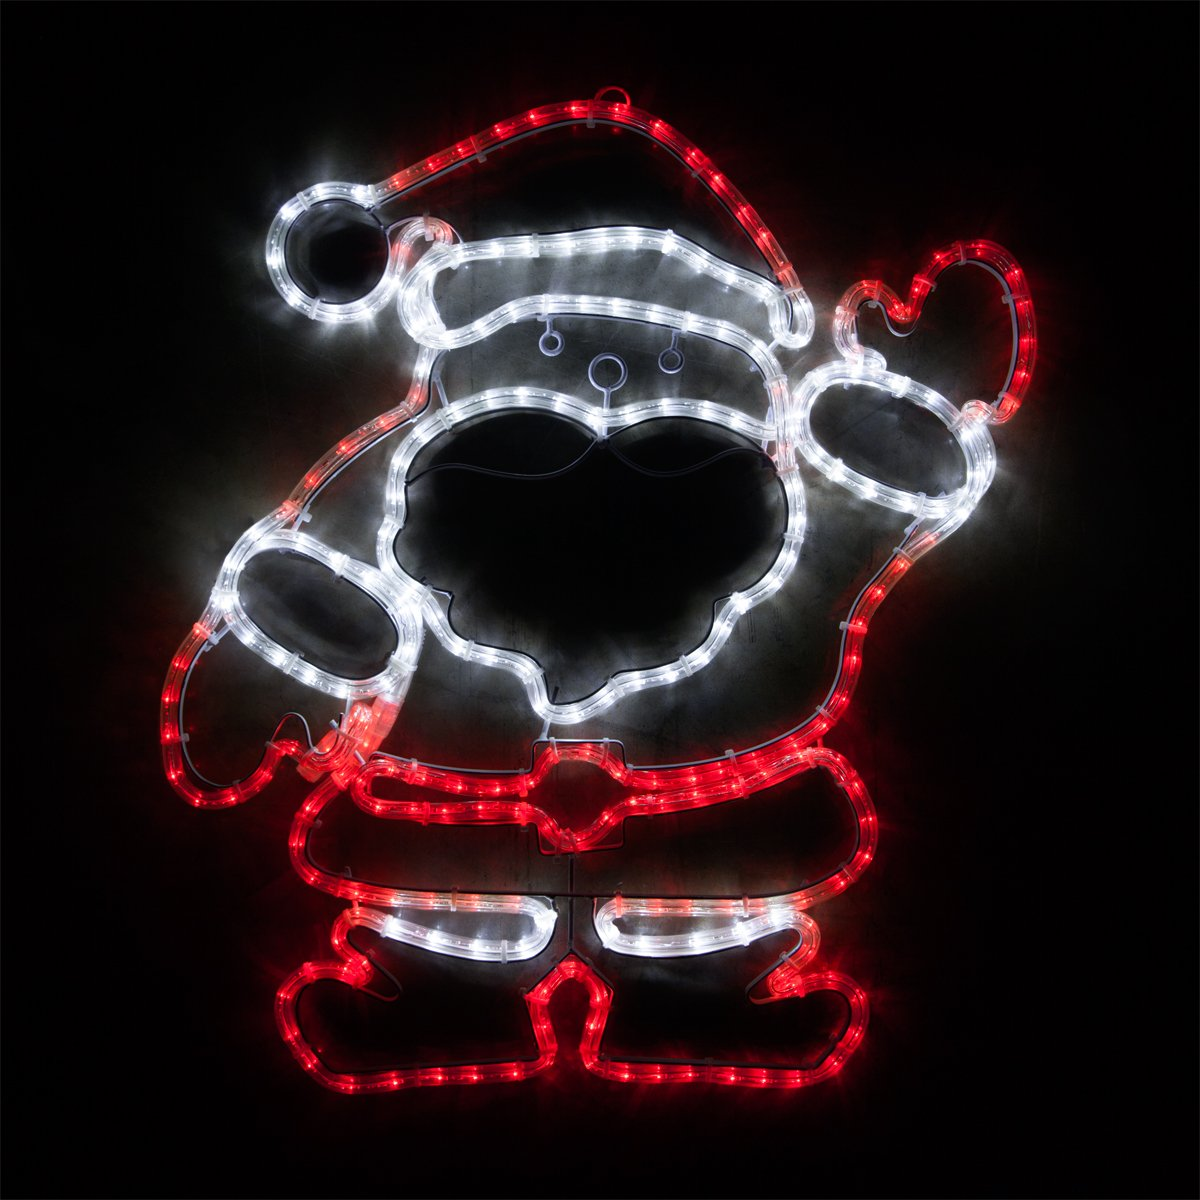 Wintergreen Lighting Outdoor Santa Decorations – Santa Christmas Outdoor Lights – Santa Claus Yard Decorations, Outdoor Christmas Decorations (28-Inch LED Yard Santa)